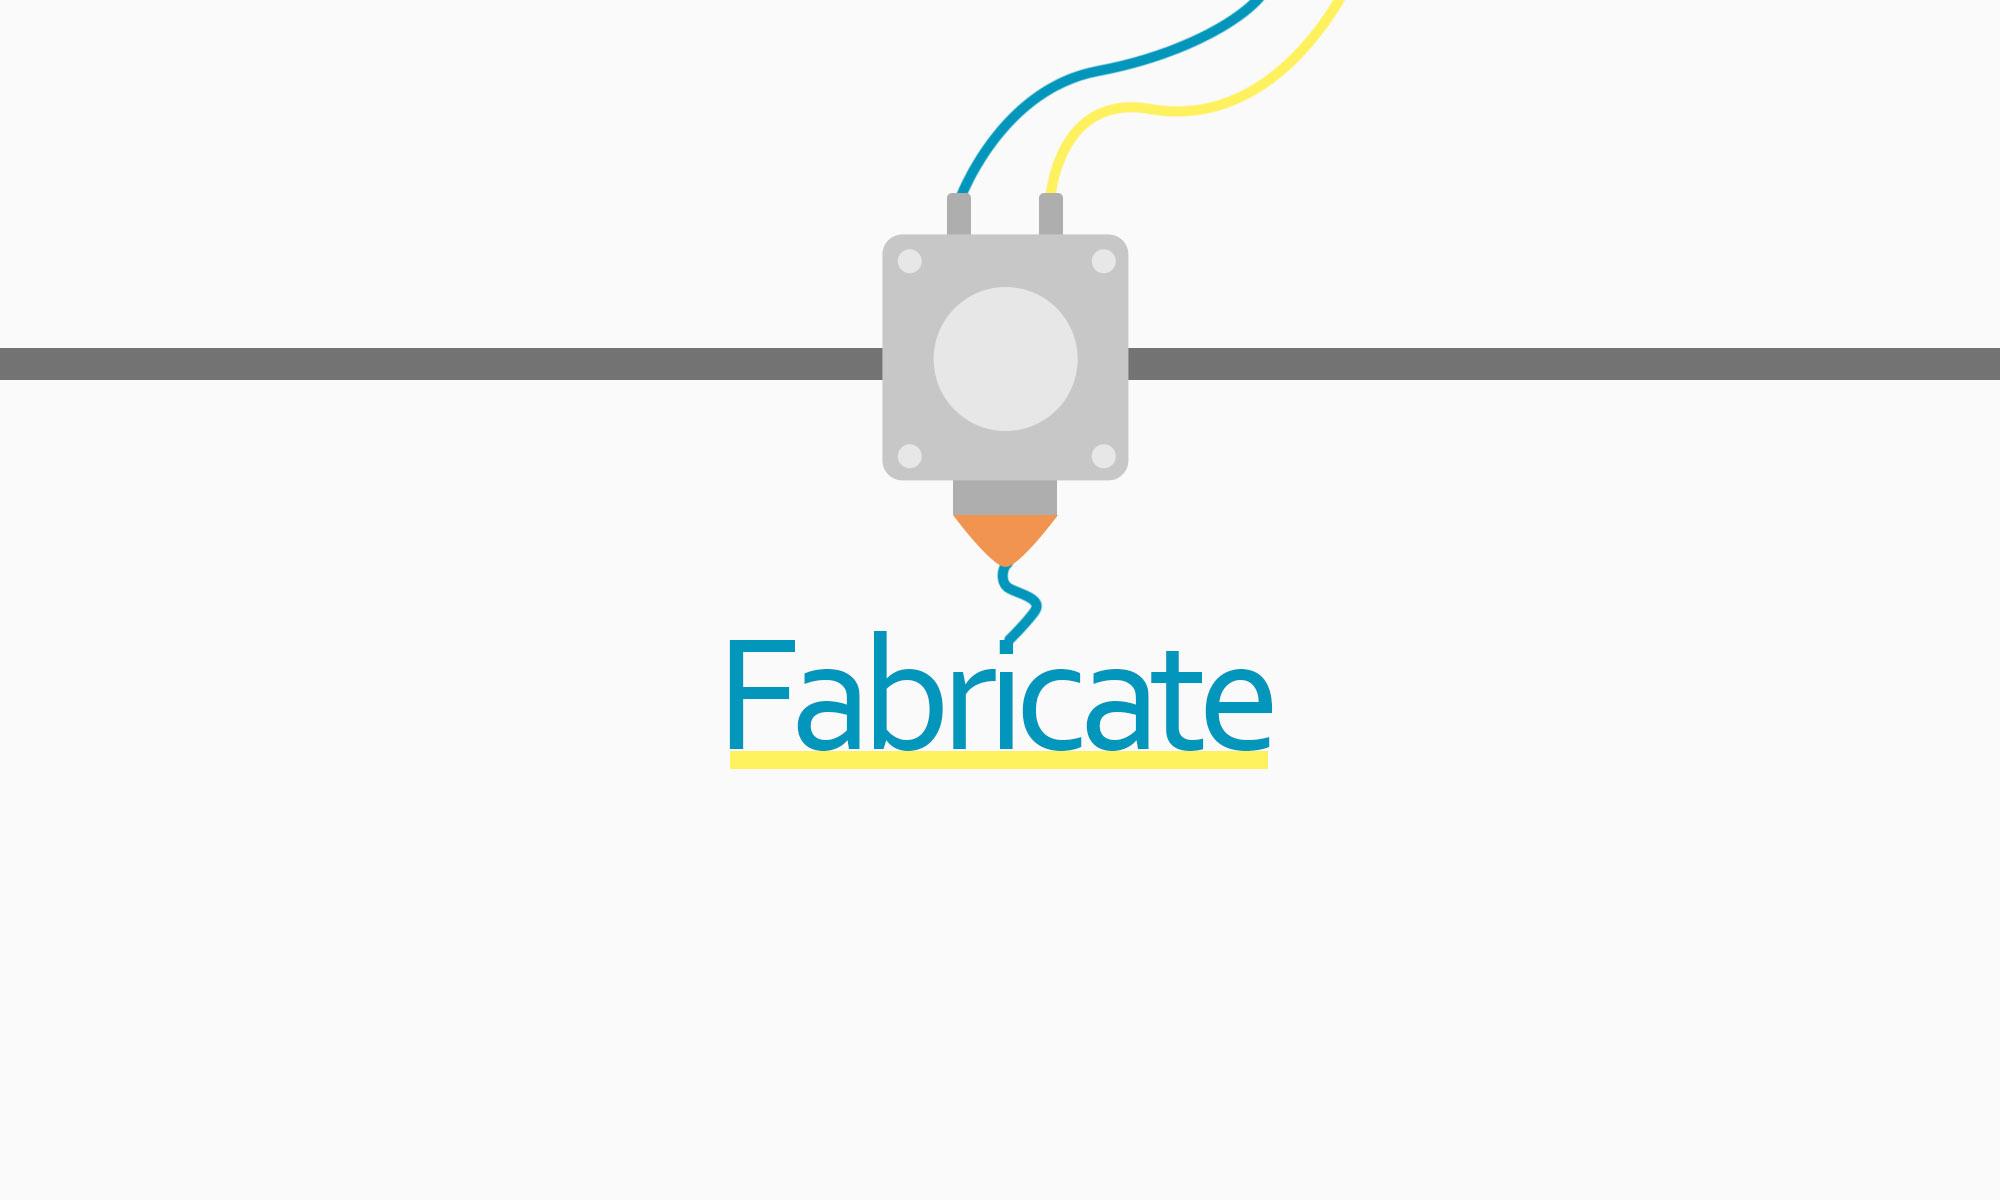 Fabricate at Robocraze, TIF Labs